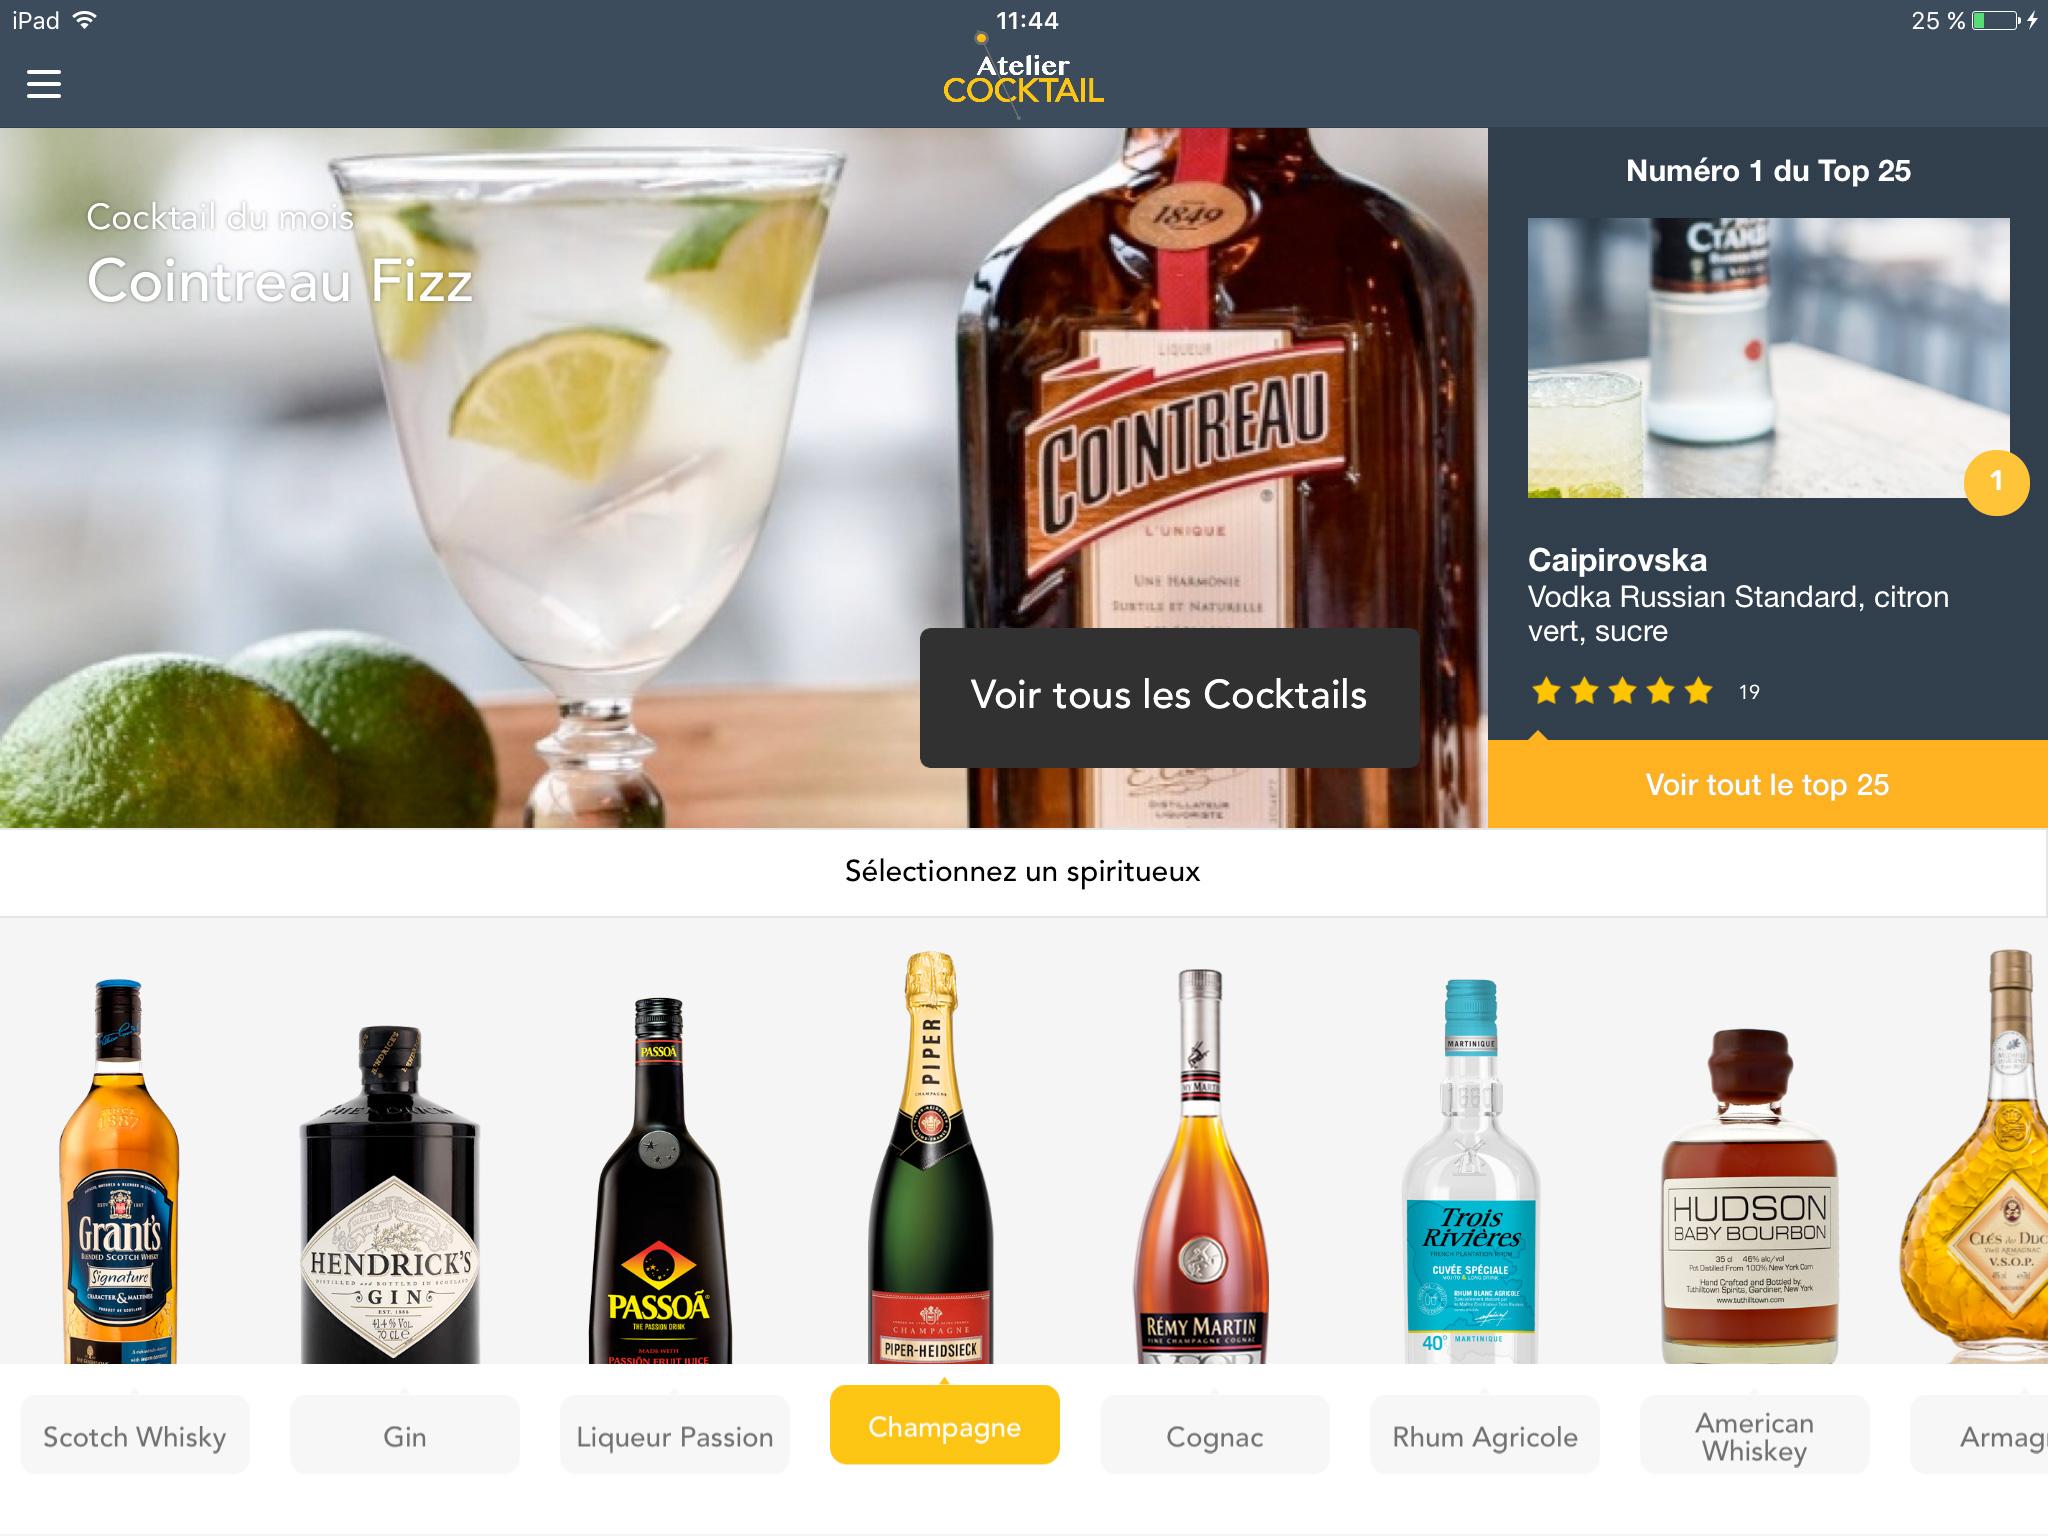 atelier-cocktail-lixir-appli-cocktail